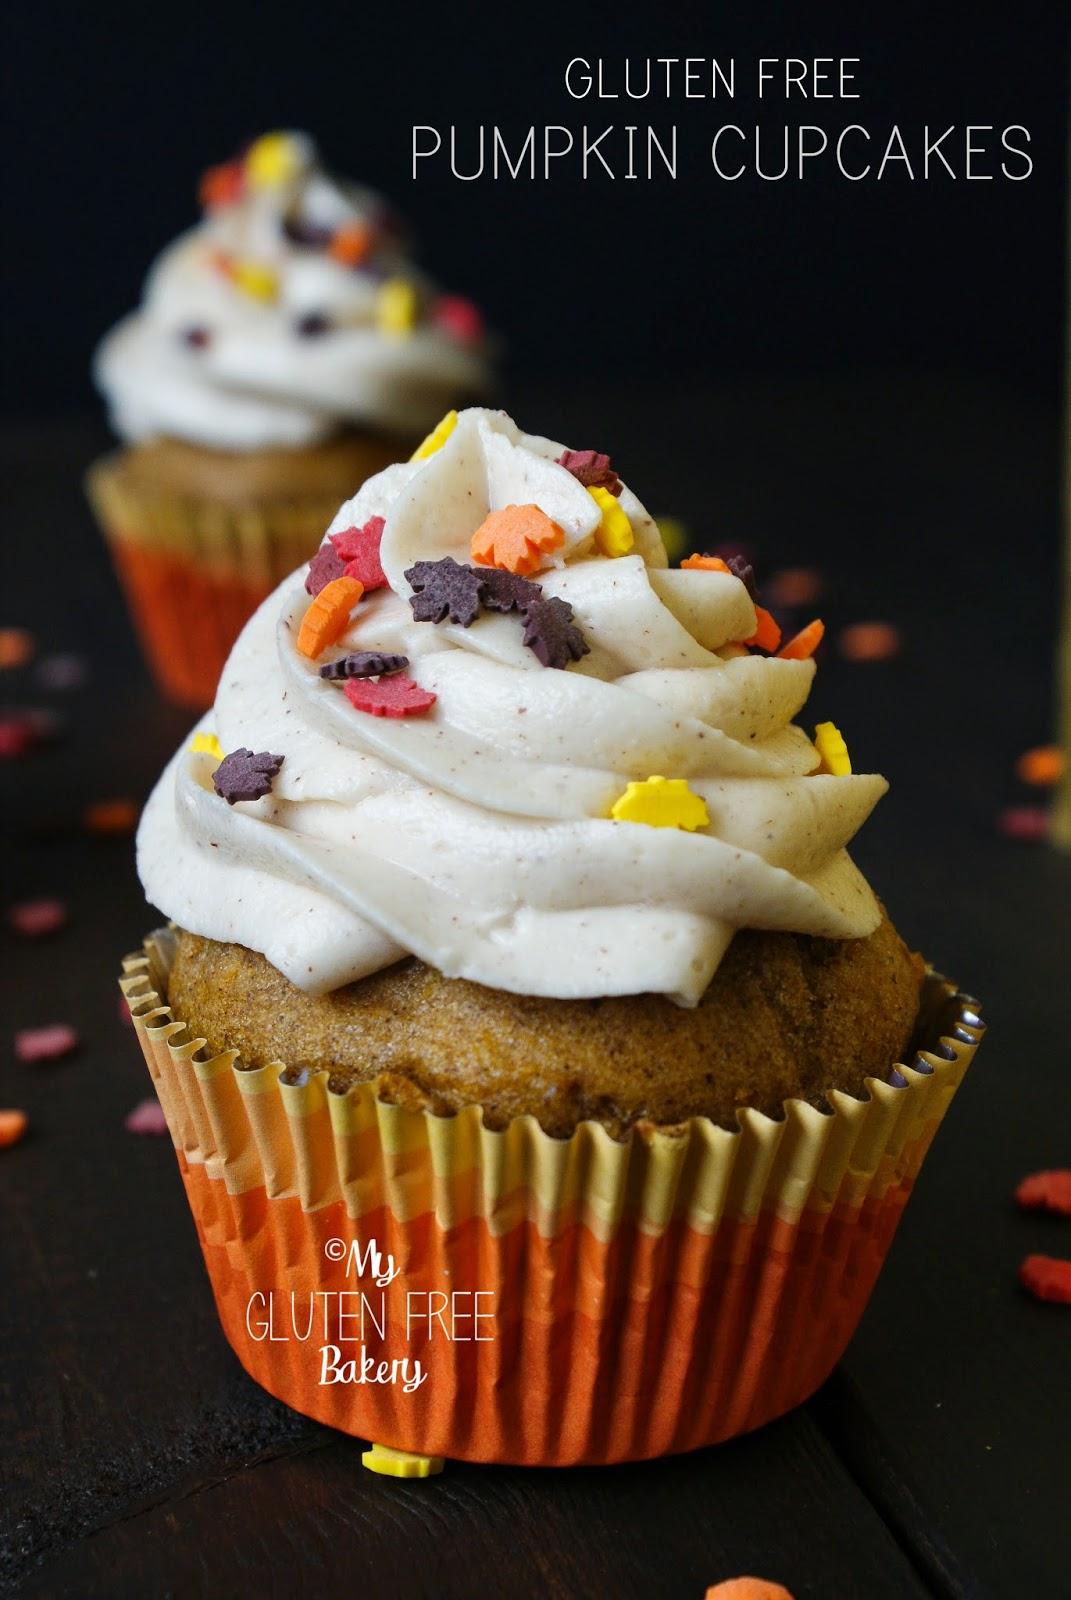 My Gluten Free Bakery: Gluten Free Pumpkin Cupcakes